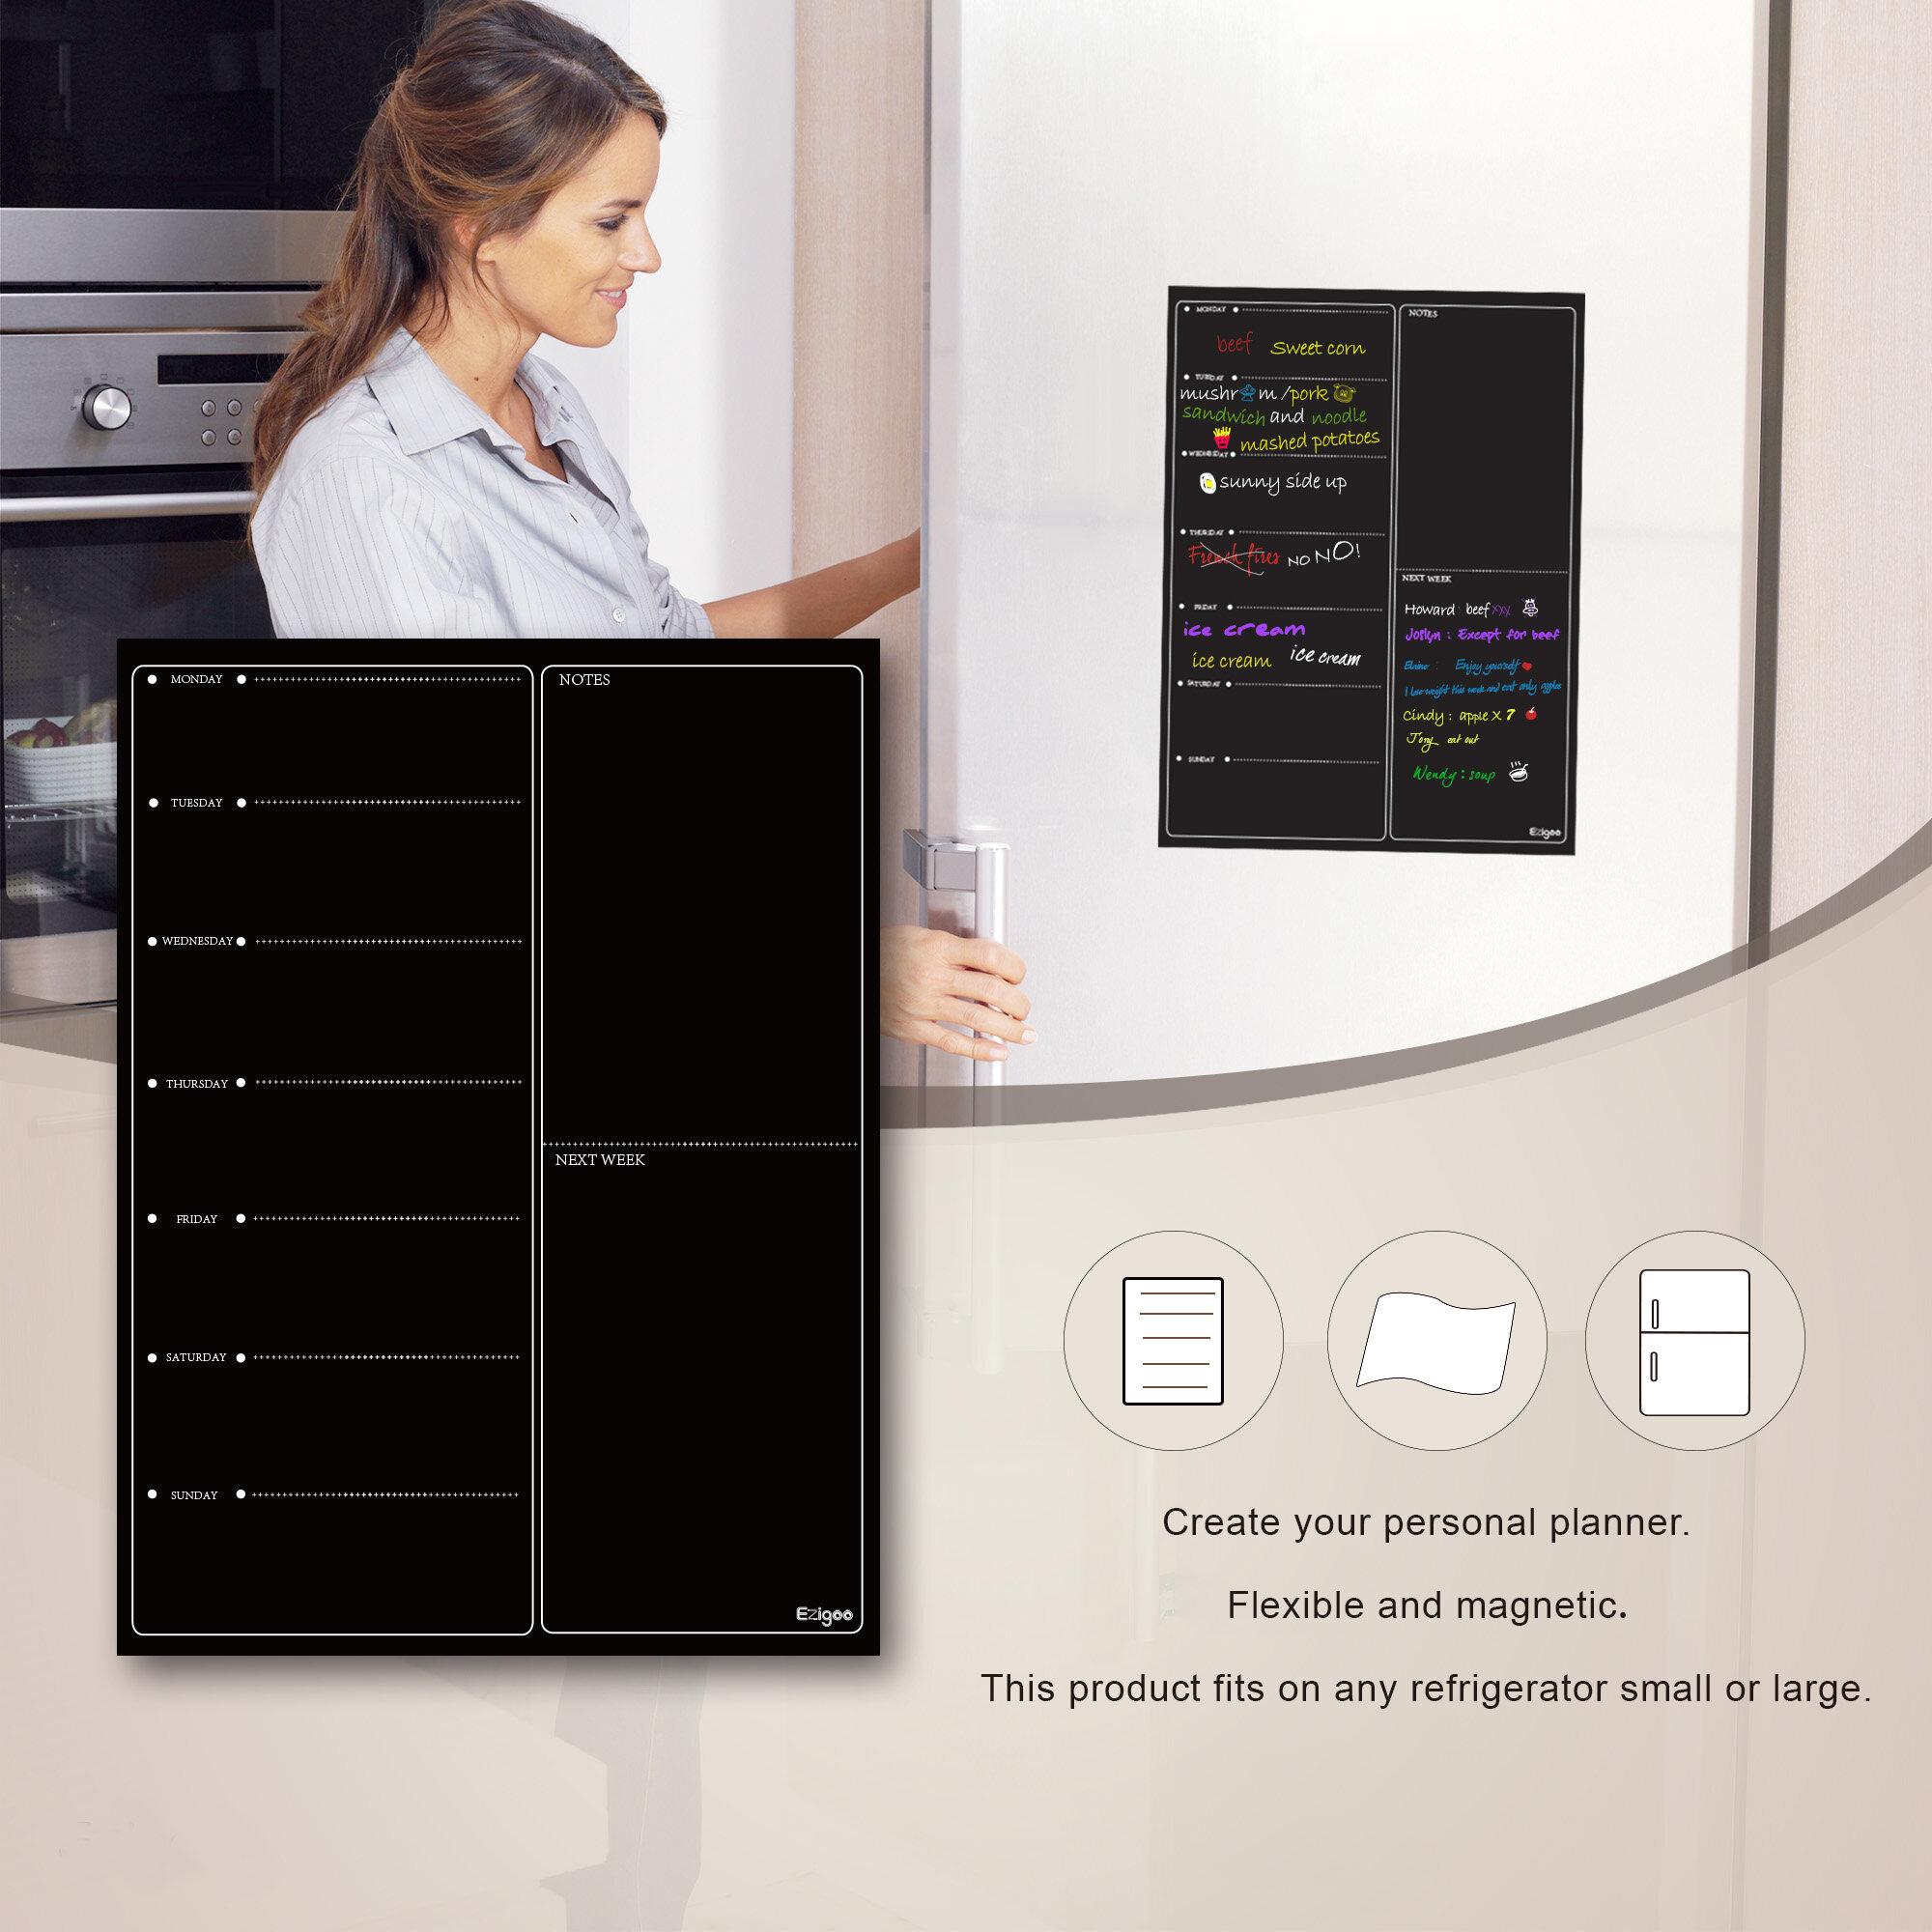 Symple Stuff Magnetic Meal Planner Kitchen Wall Mounted Chalkboard Wayfair Co Uk